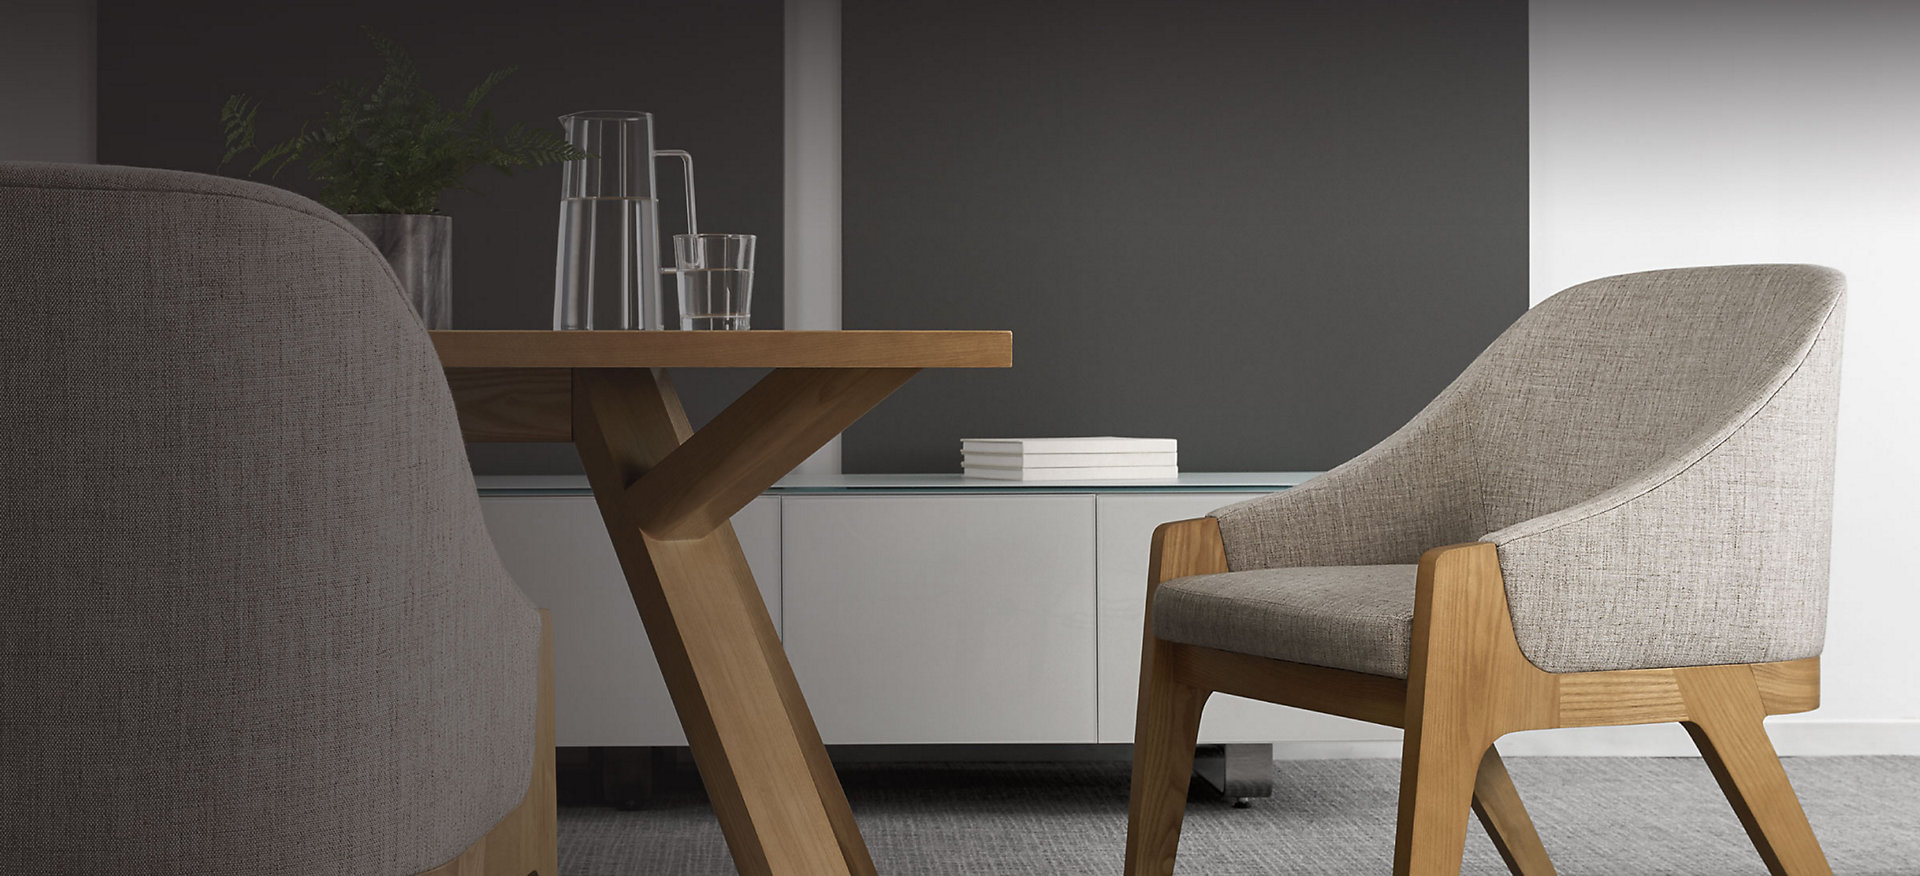 images for furniture design.  For HomePageHeroCaliaSaranac Throughout Images For Furniture Design